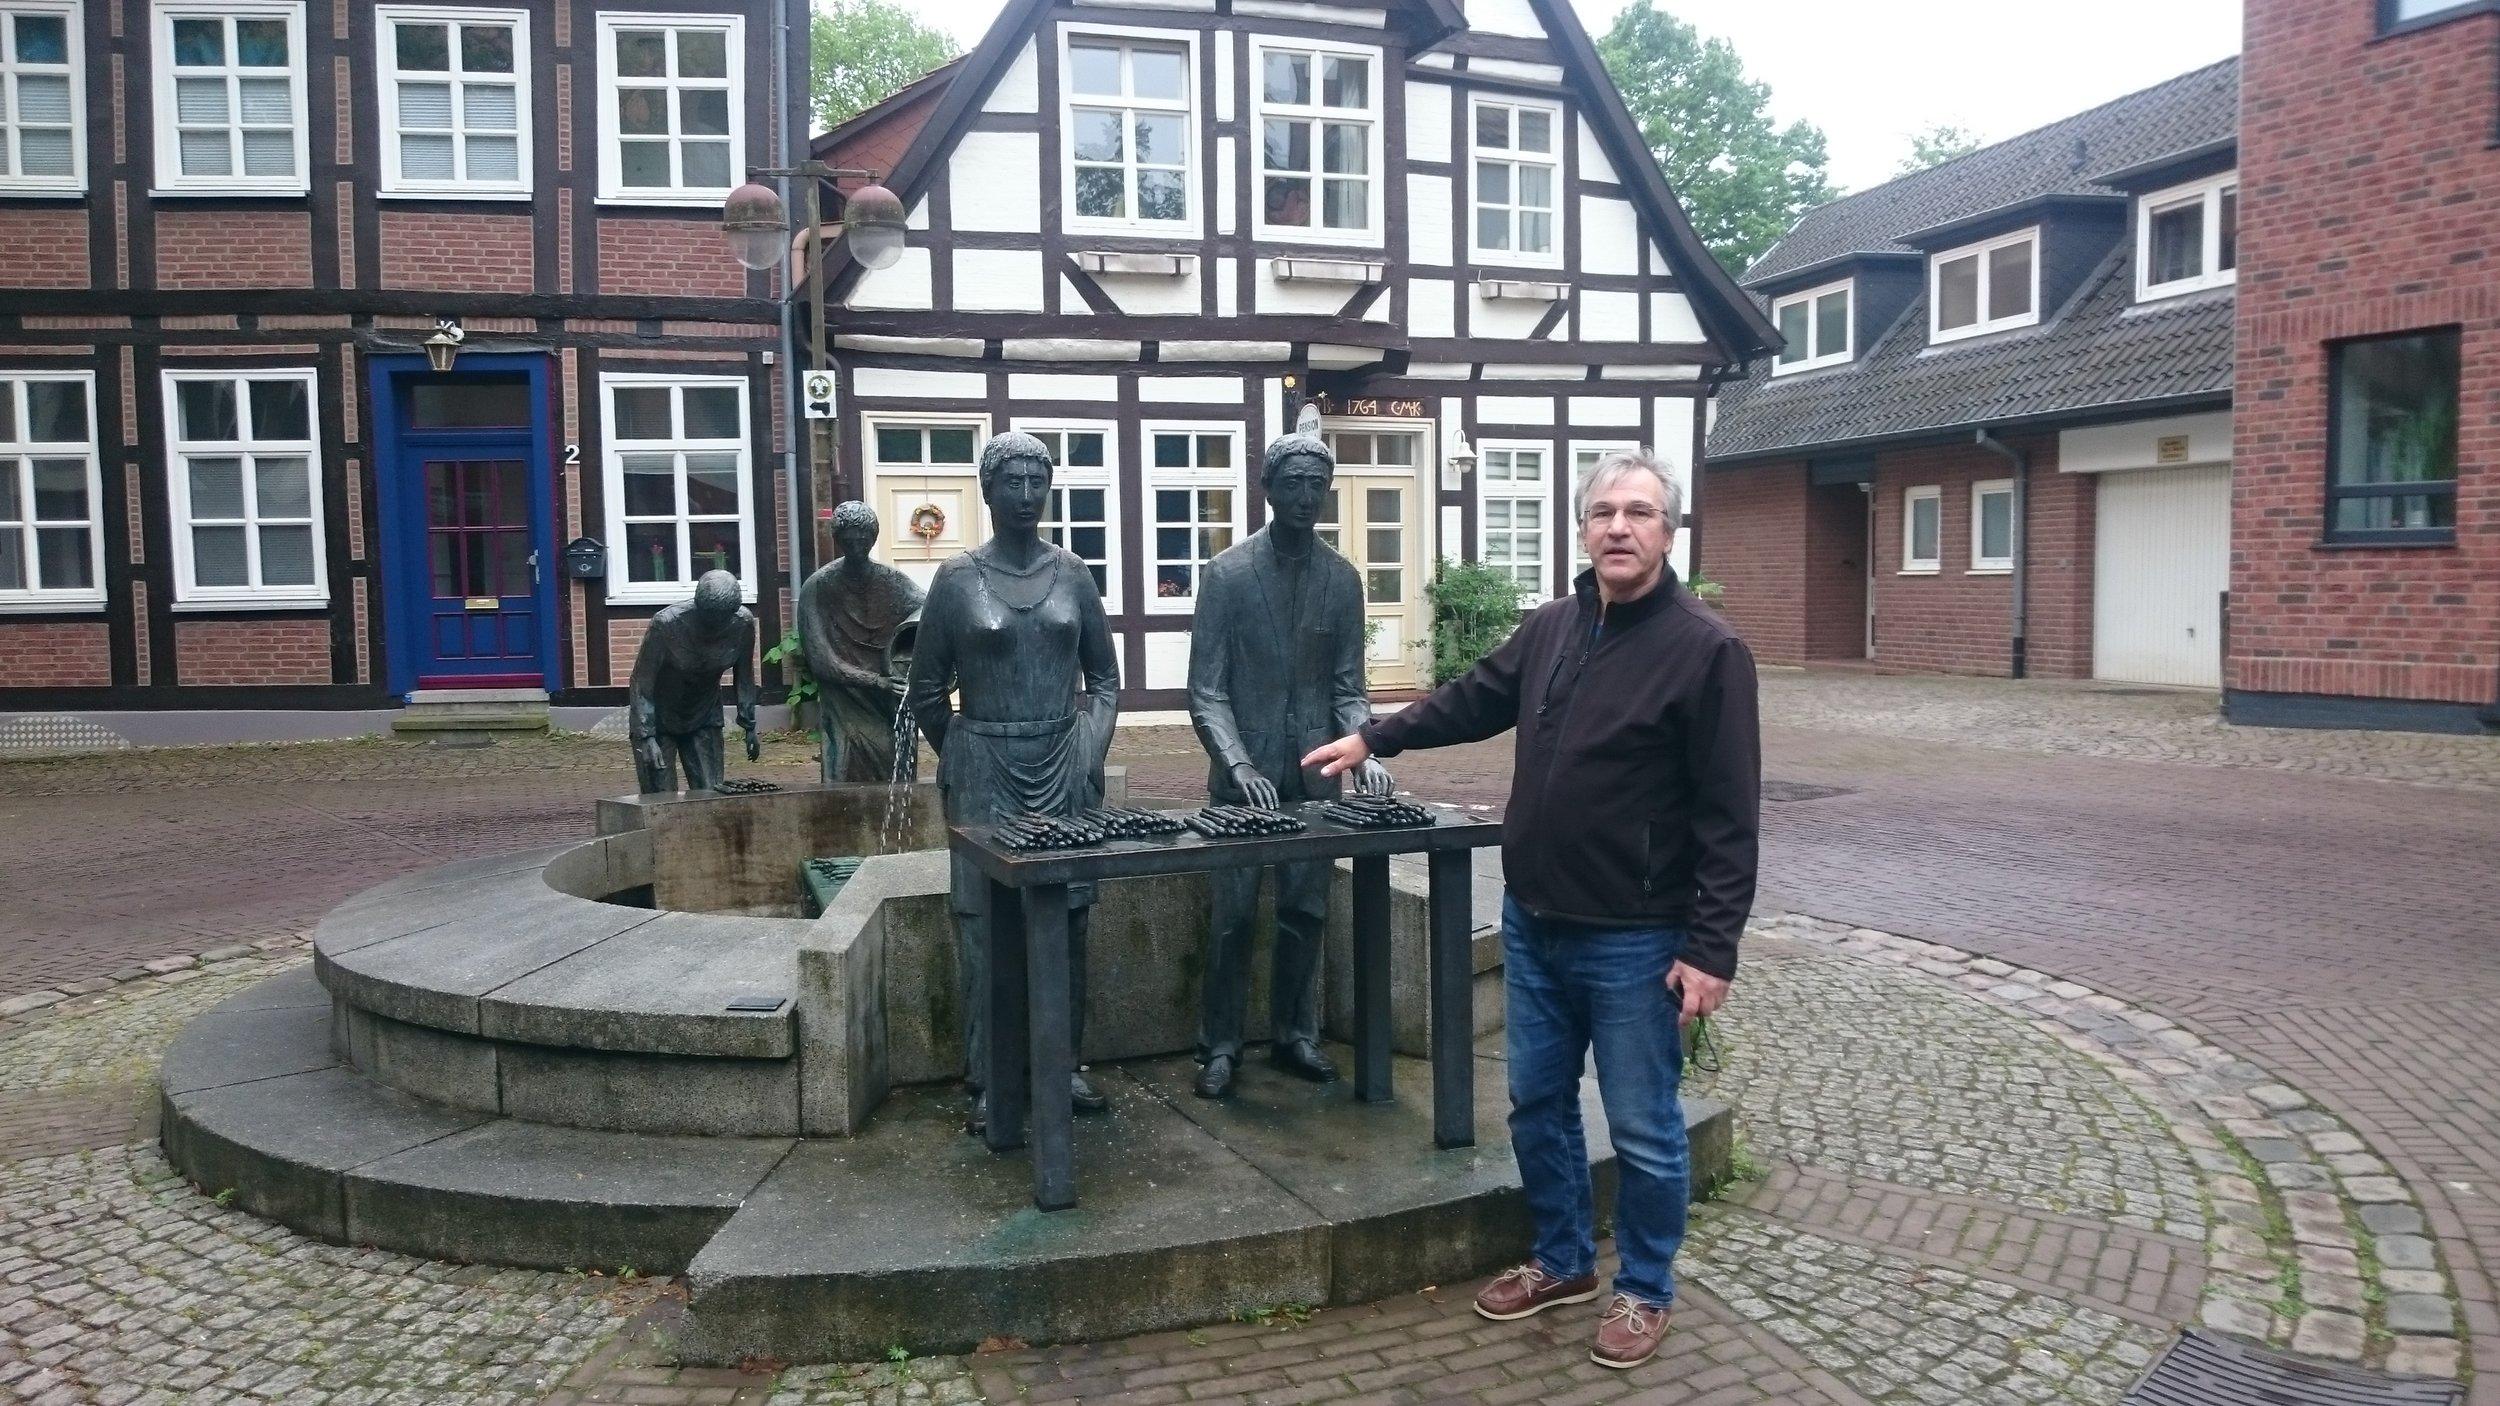 maiwanderfahrt-weser-2019-2_0115_2019-04-29_16-01-22.jpg